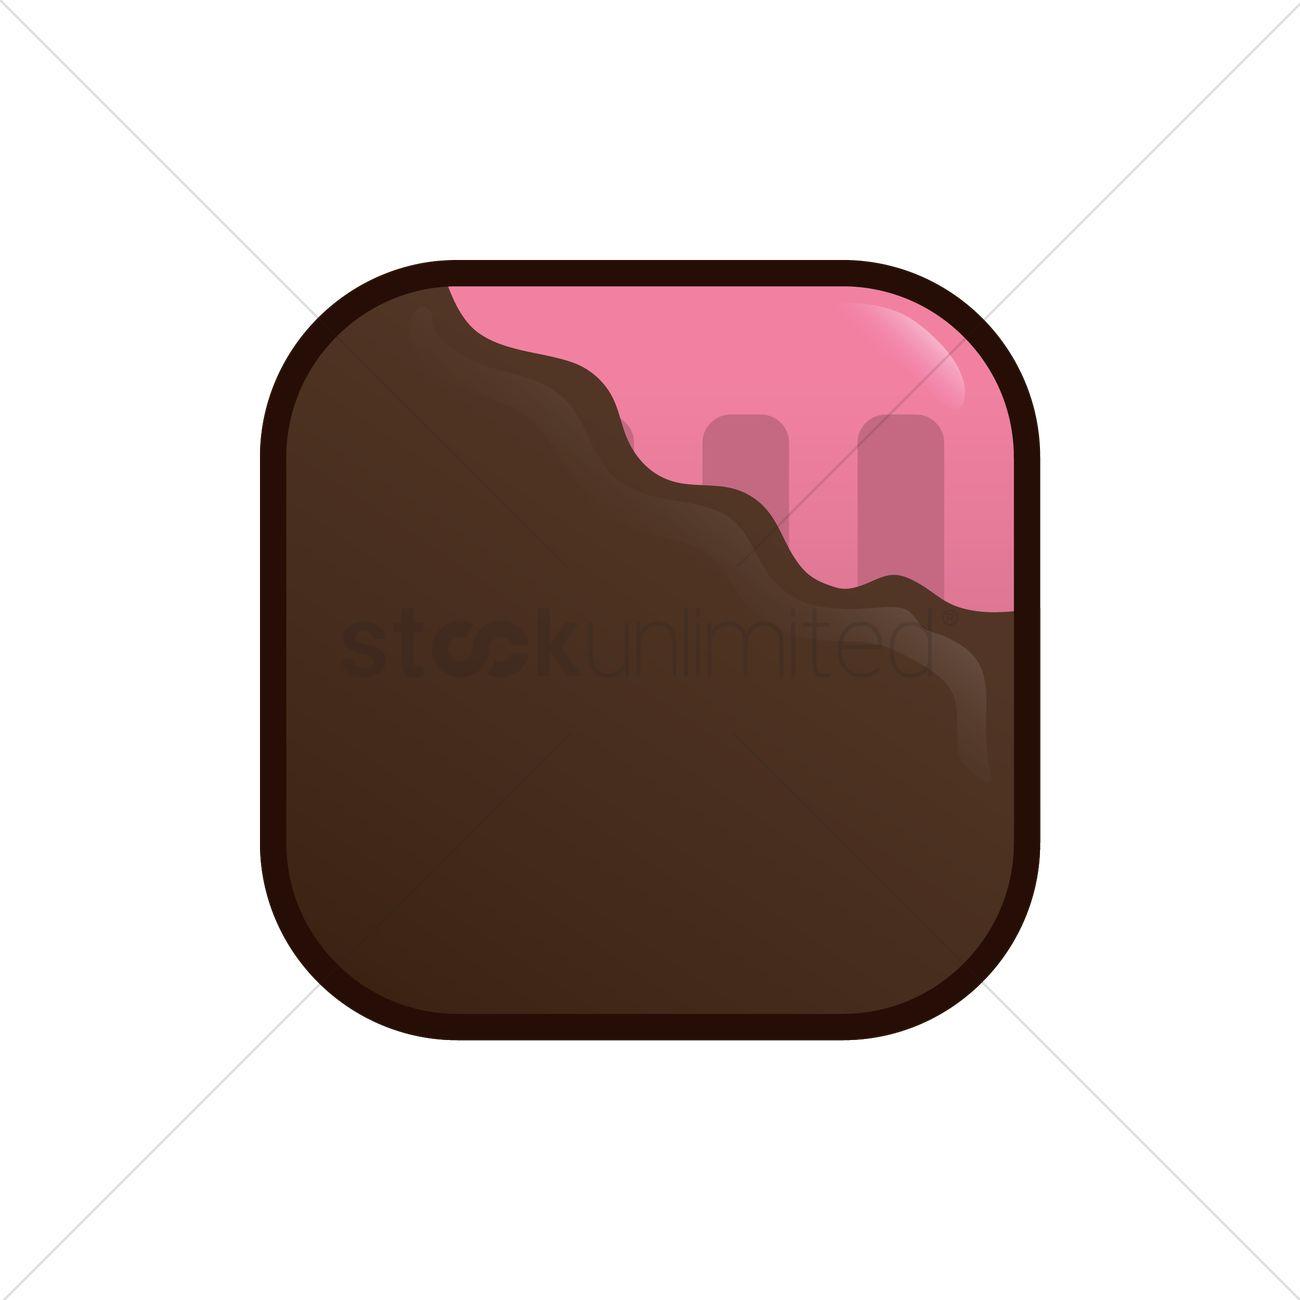 Ice cream bar with chocolate coating Vector Image.